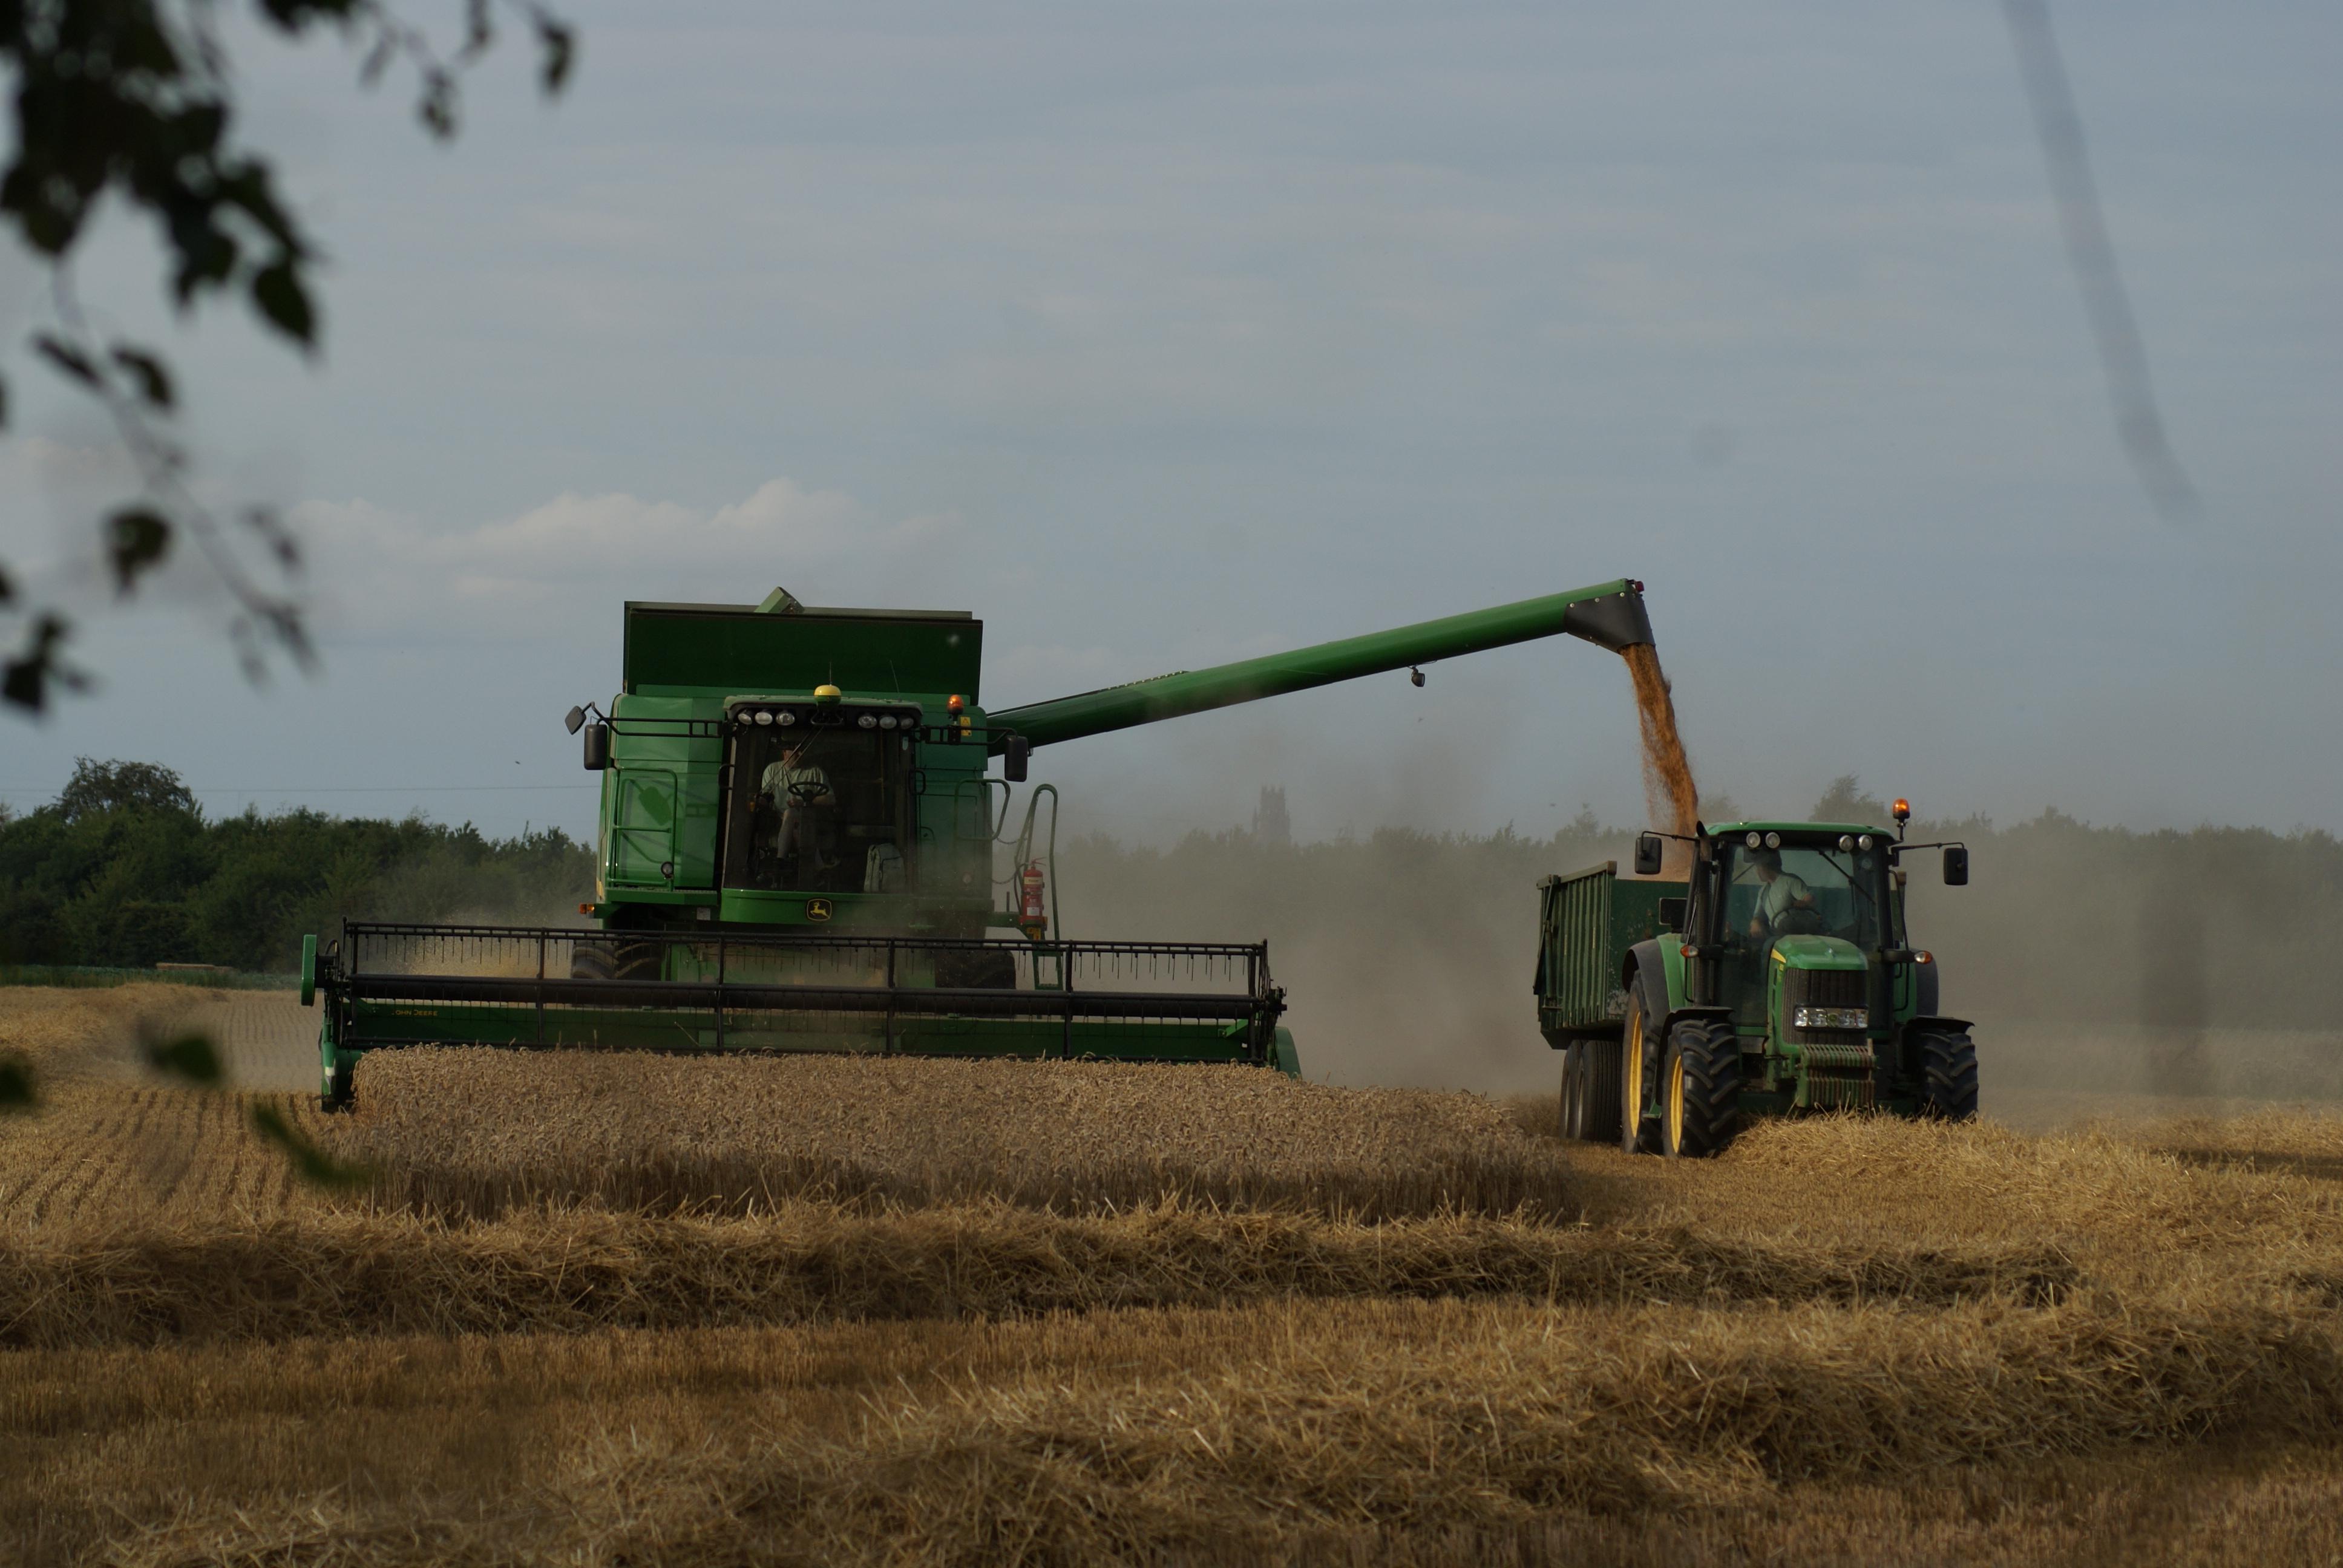 John Deere 214 >> File:John Deere T670i at harvest, Boston, Lincolnshire ...